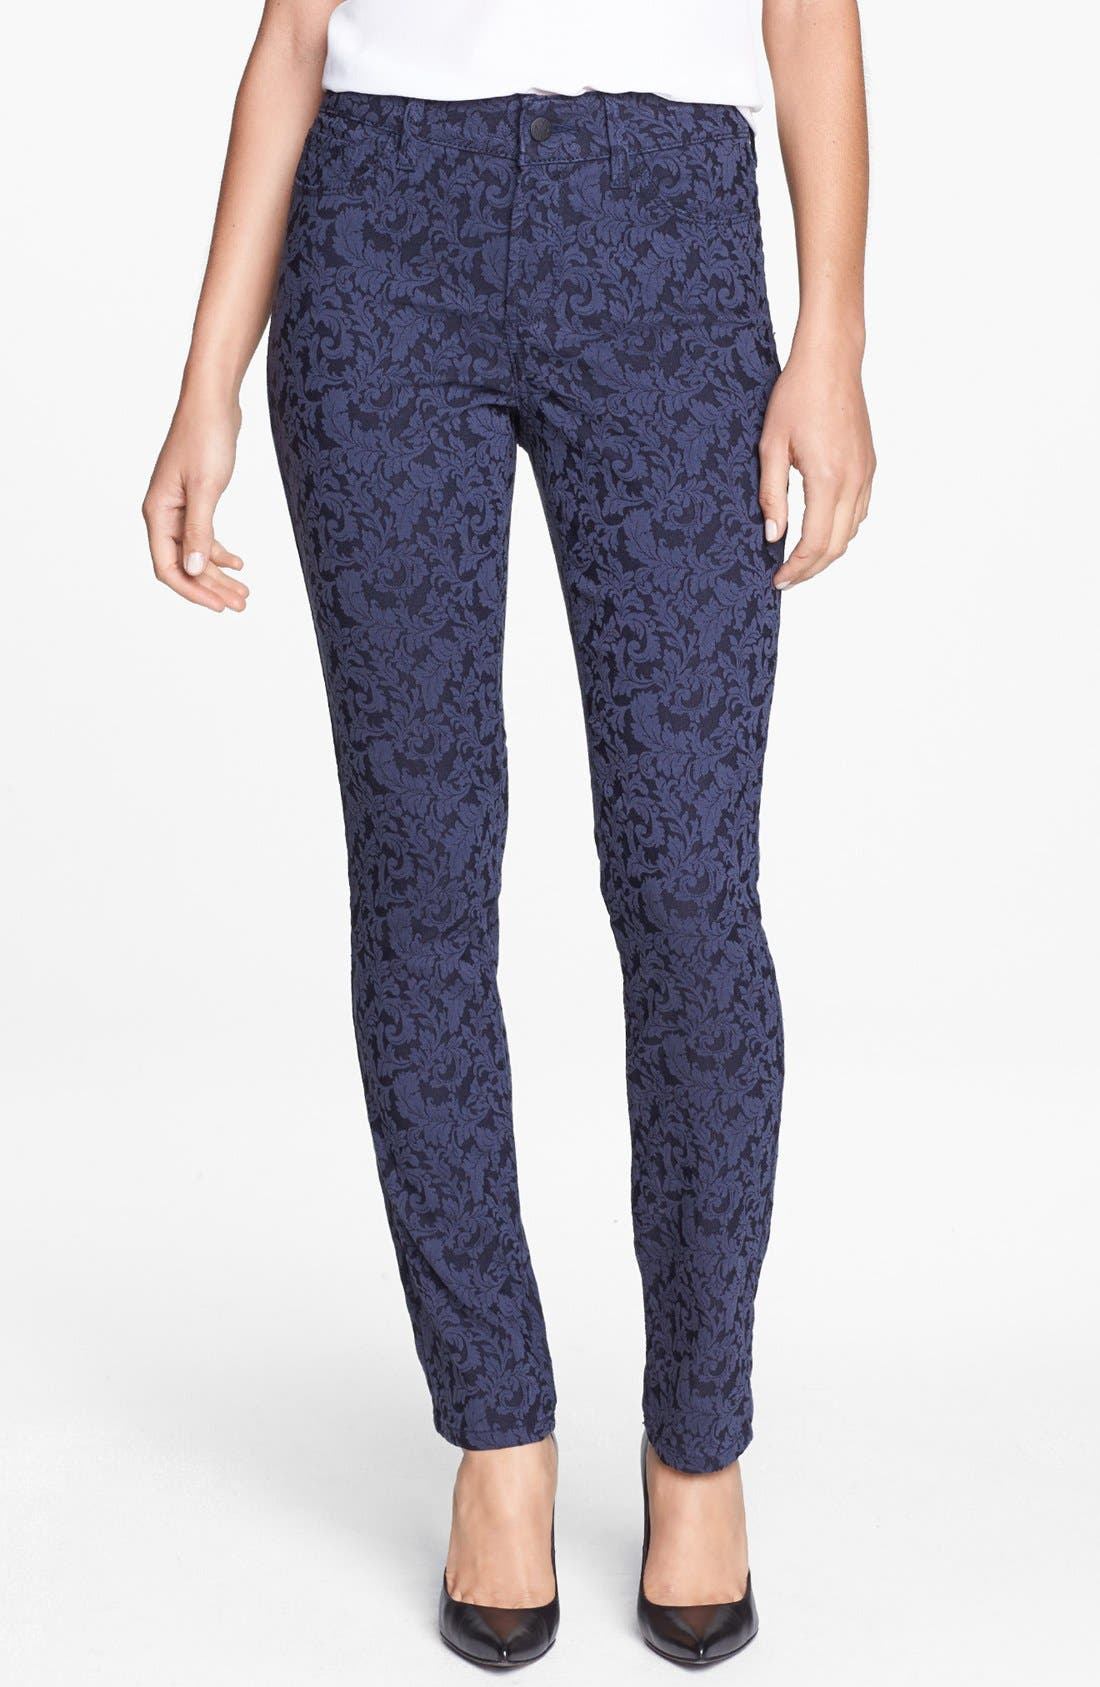 Alternate Image 1 Selected - NYDJ 'Jade' Patterned Stretch Skinny Jeans (Navy Jacquard)